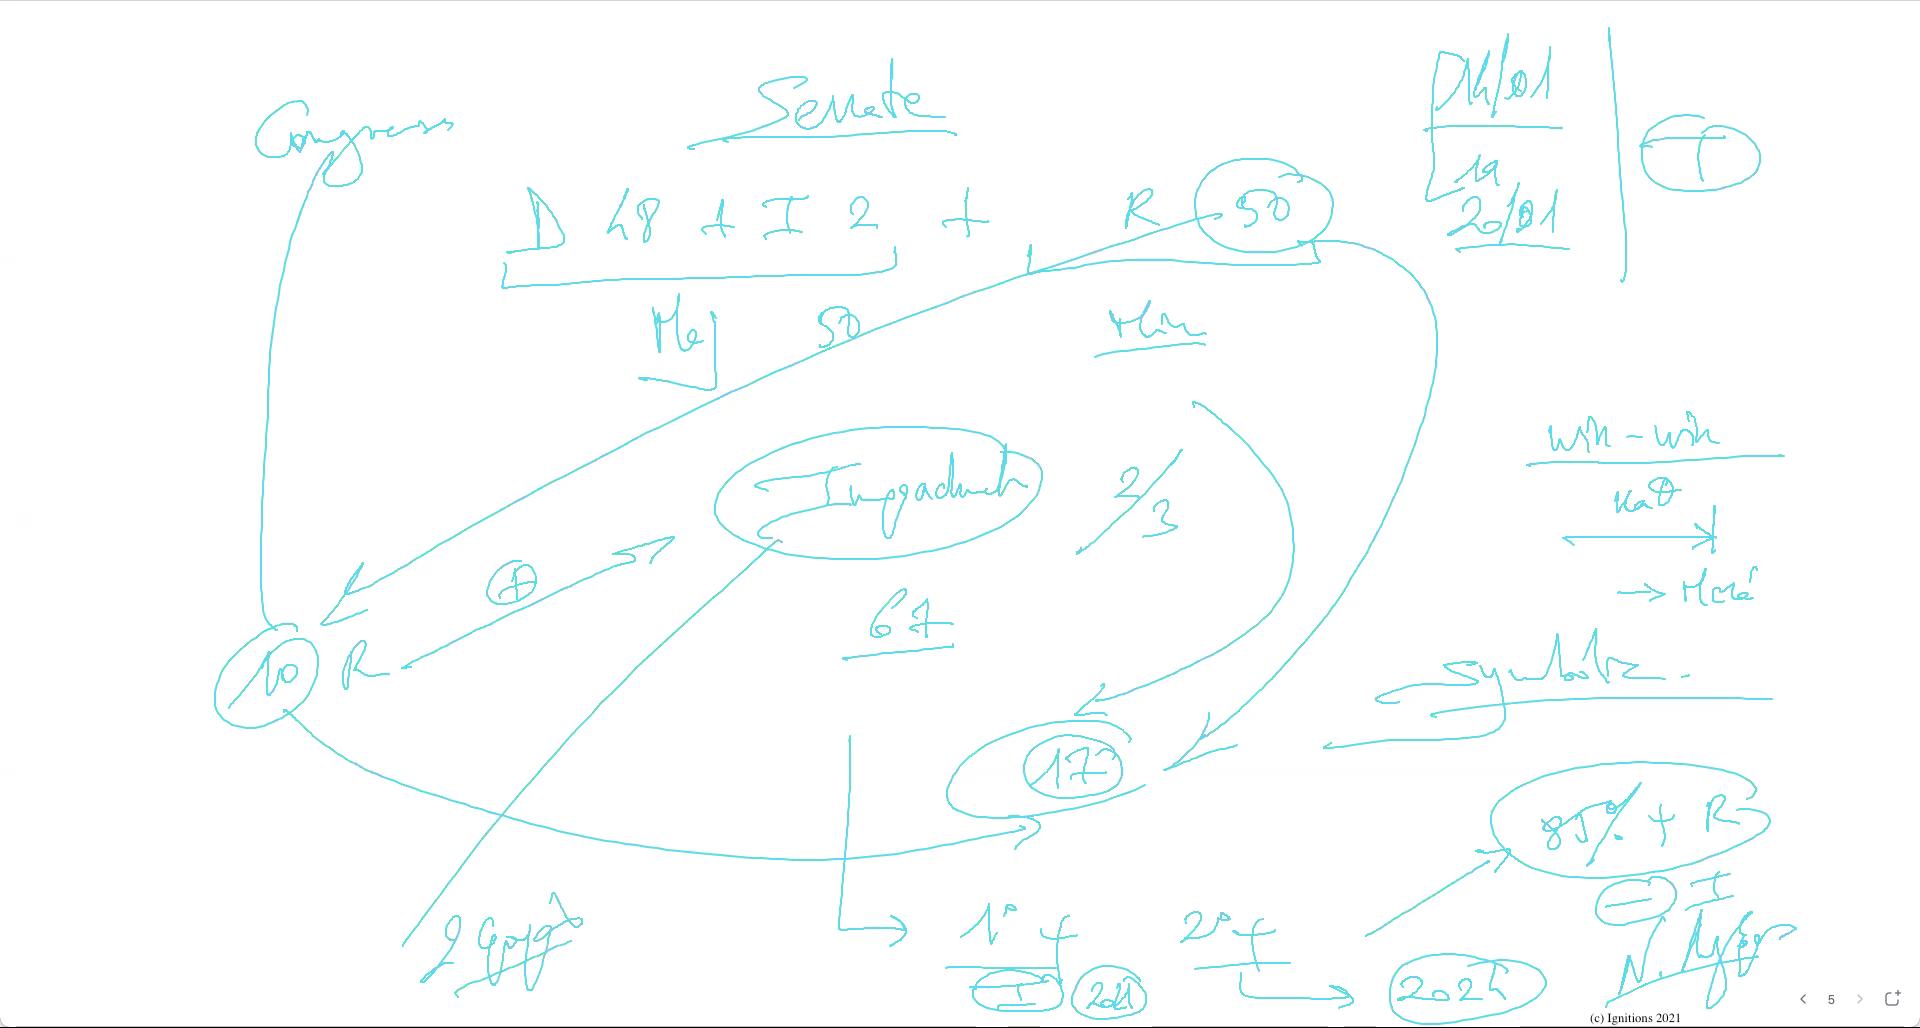 58111 - IV - e-Μάθημα: AOZ, Rafale, Εκλογές ΗΠΑ. (Dessin)